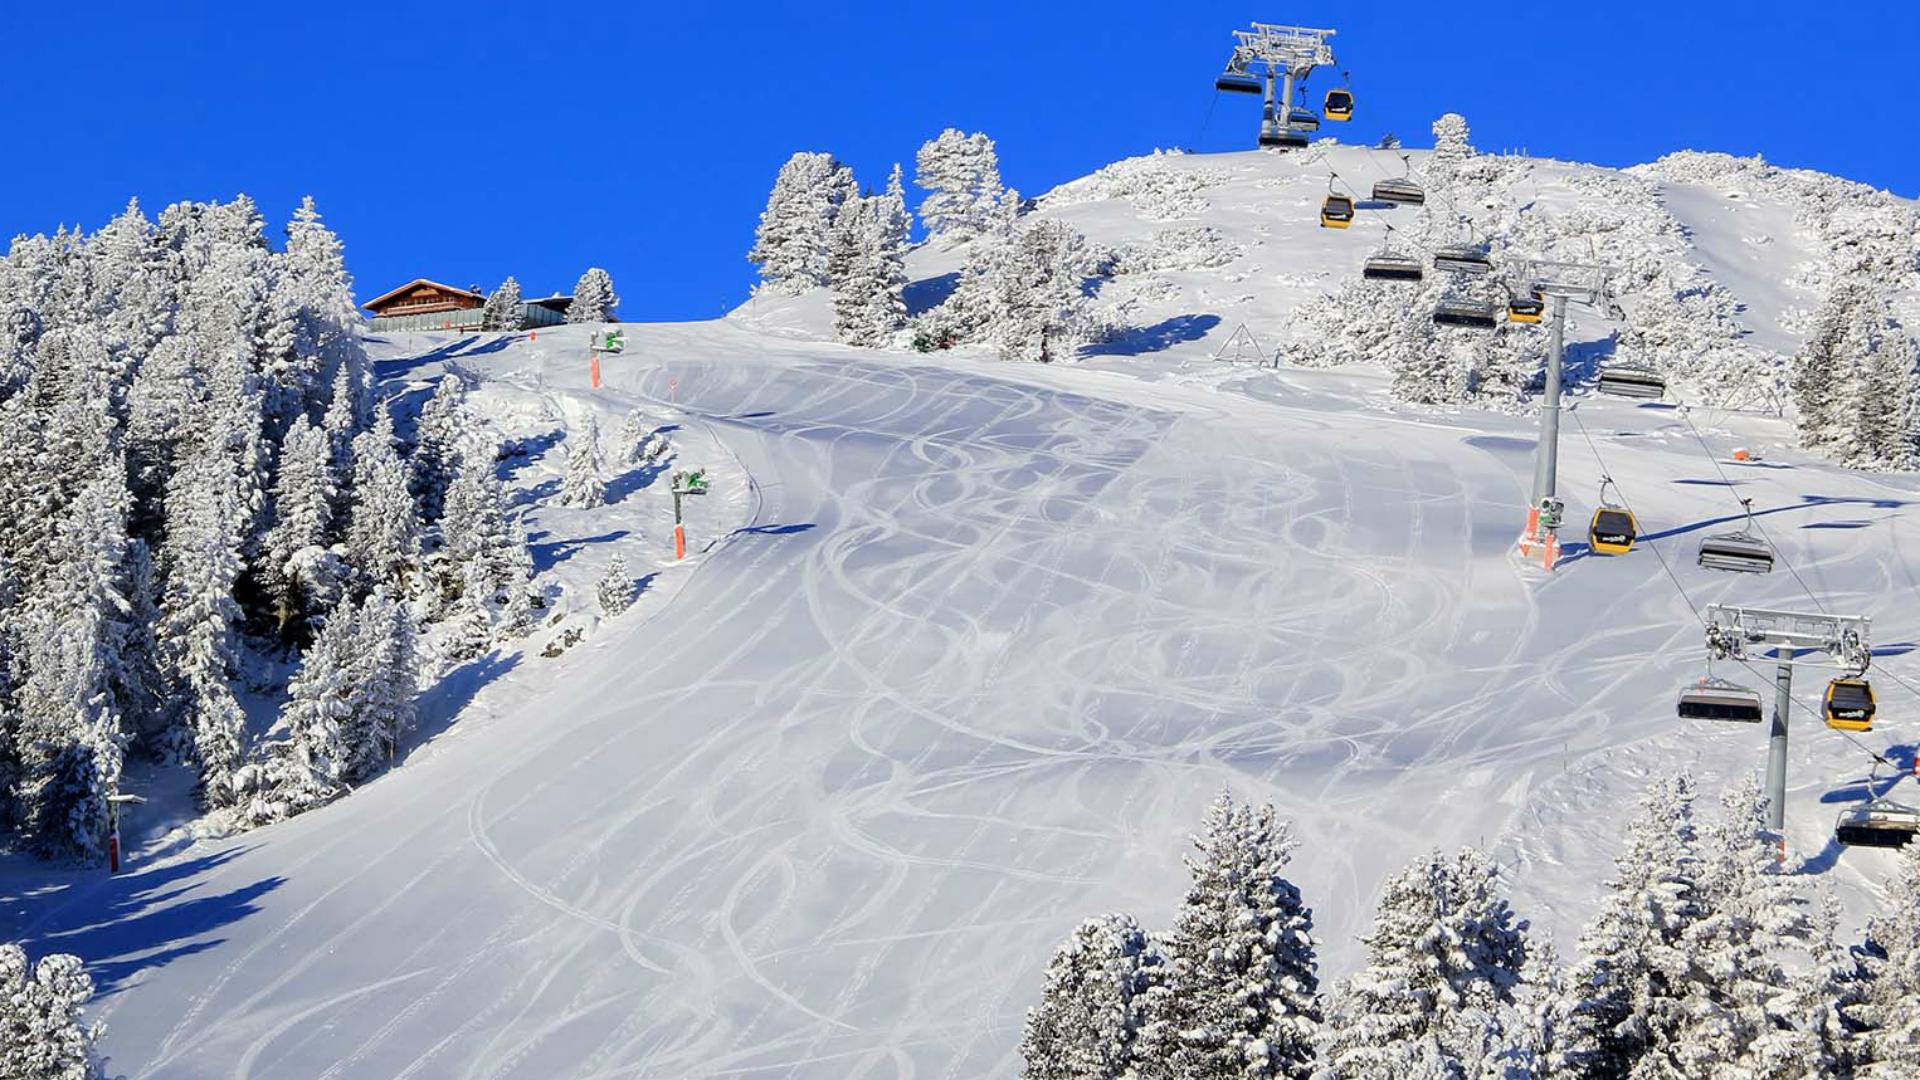 010fd1c3cdf4 Ski School Habeler - Mayrhofen - Online Booking